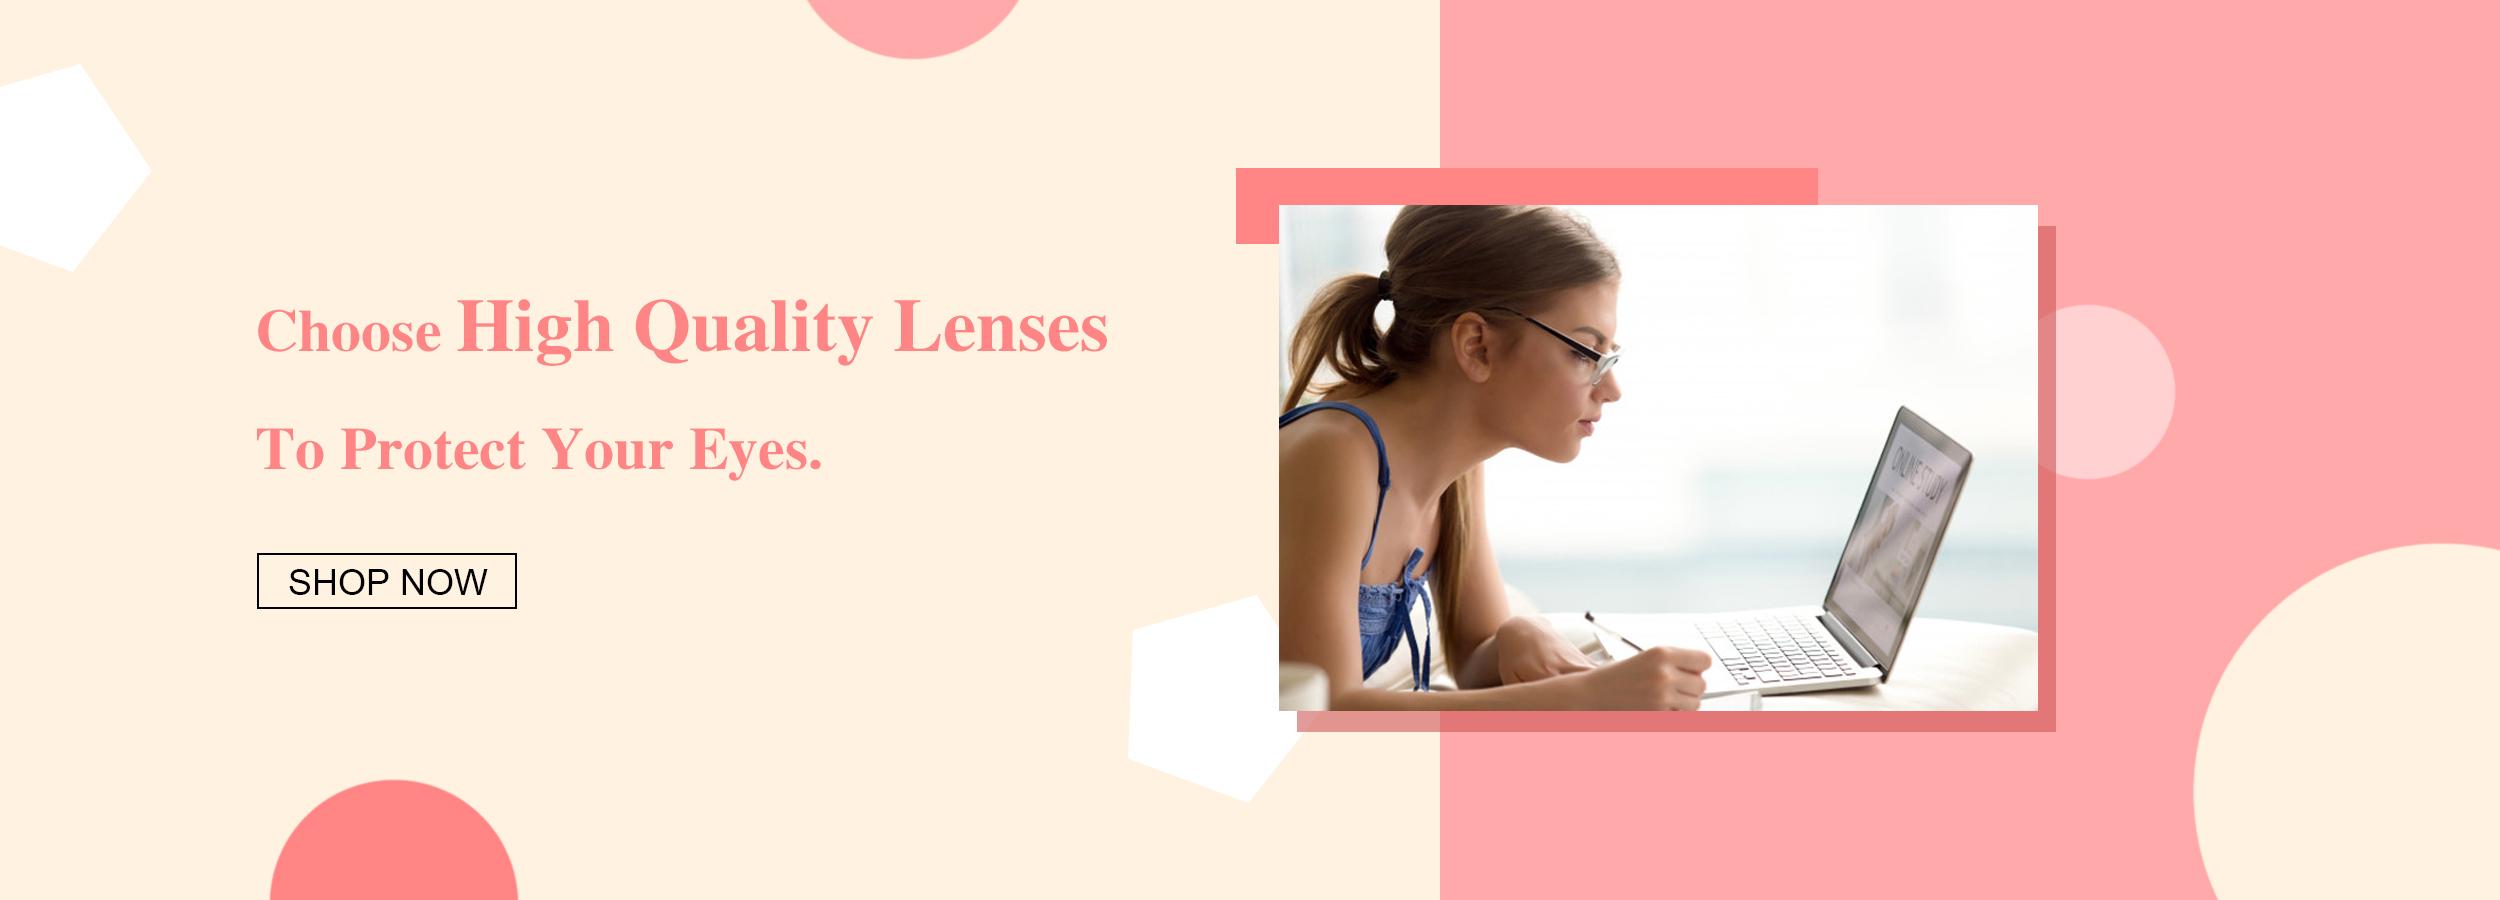 Eyeglass lenses